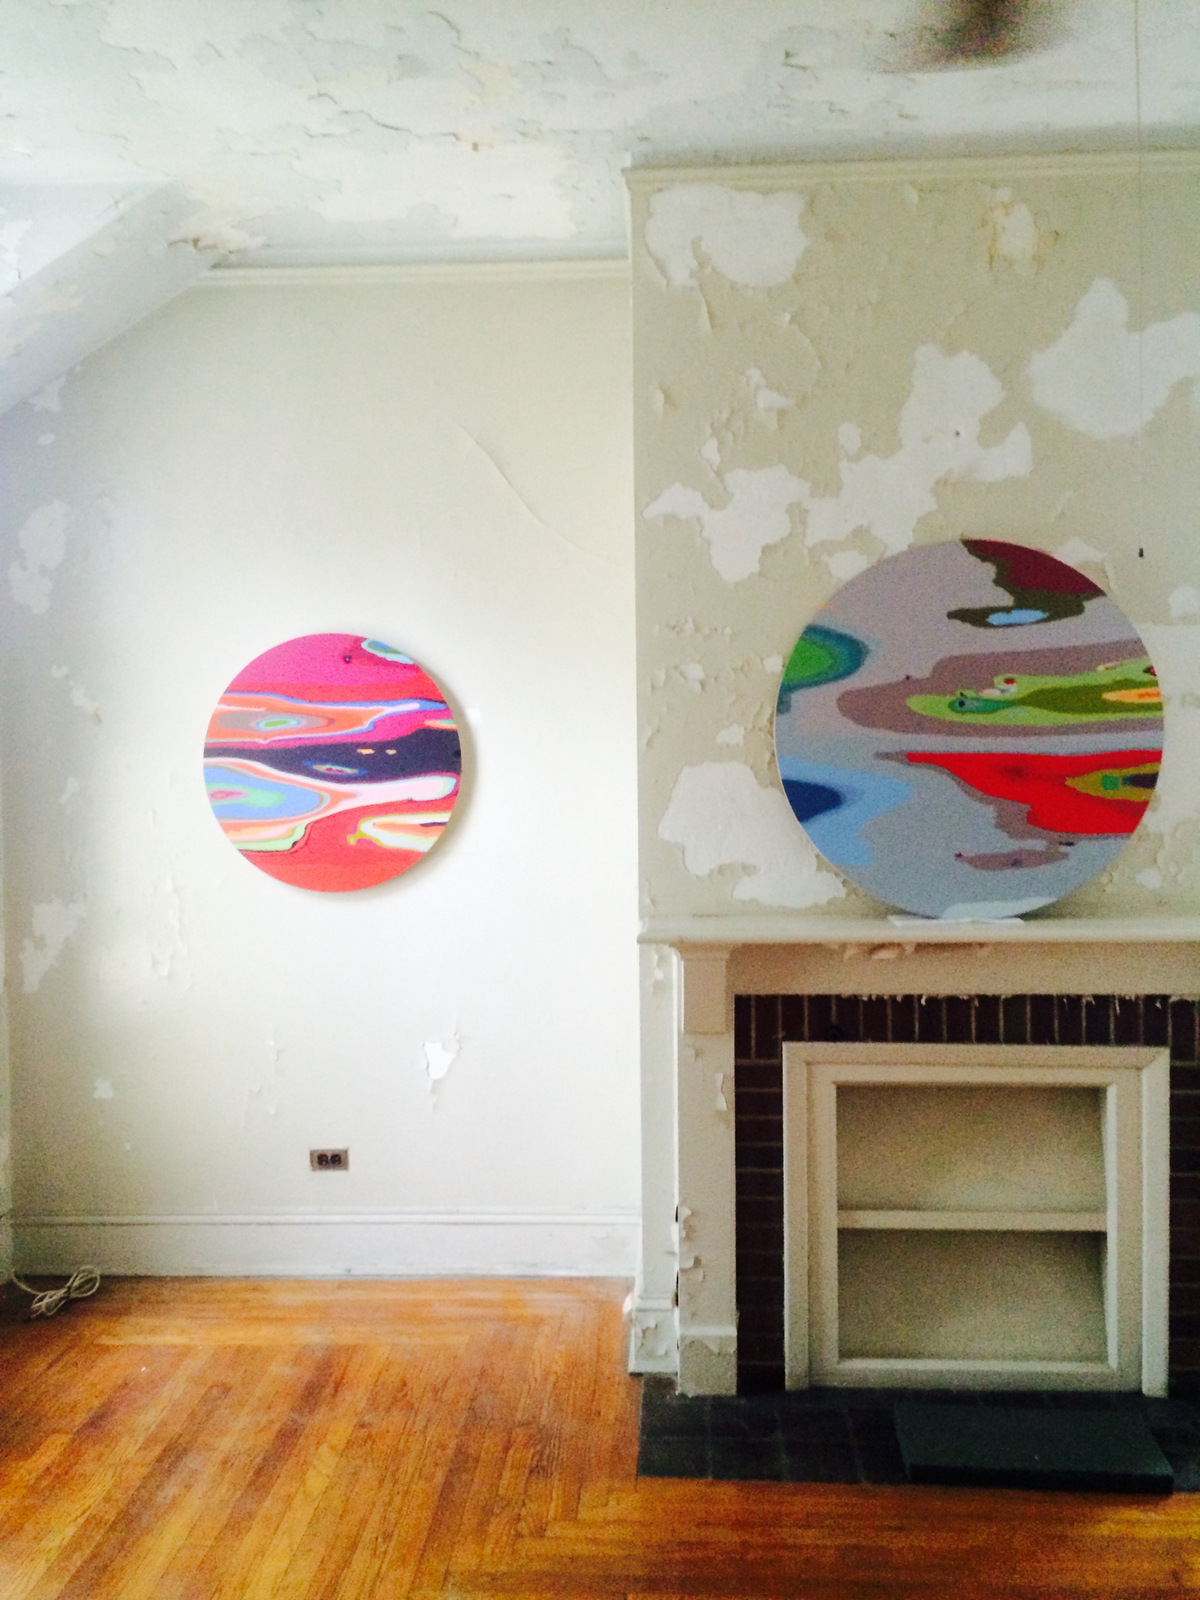 My friend Beth Reisman's work